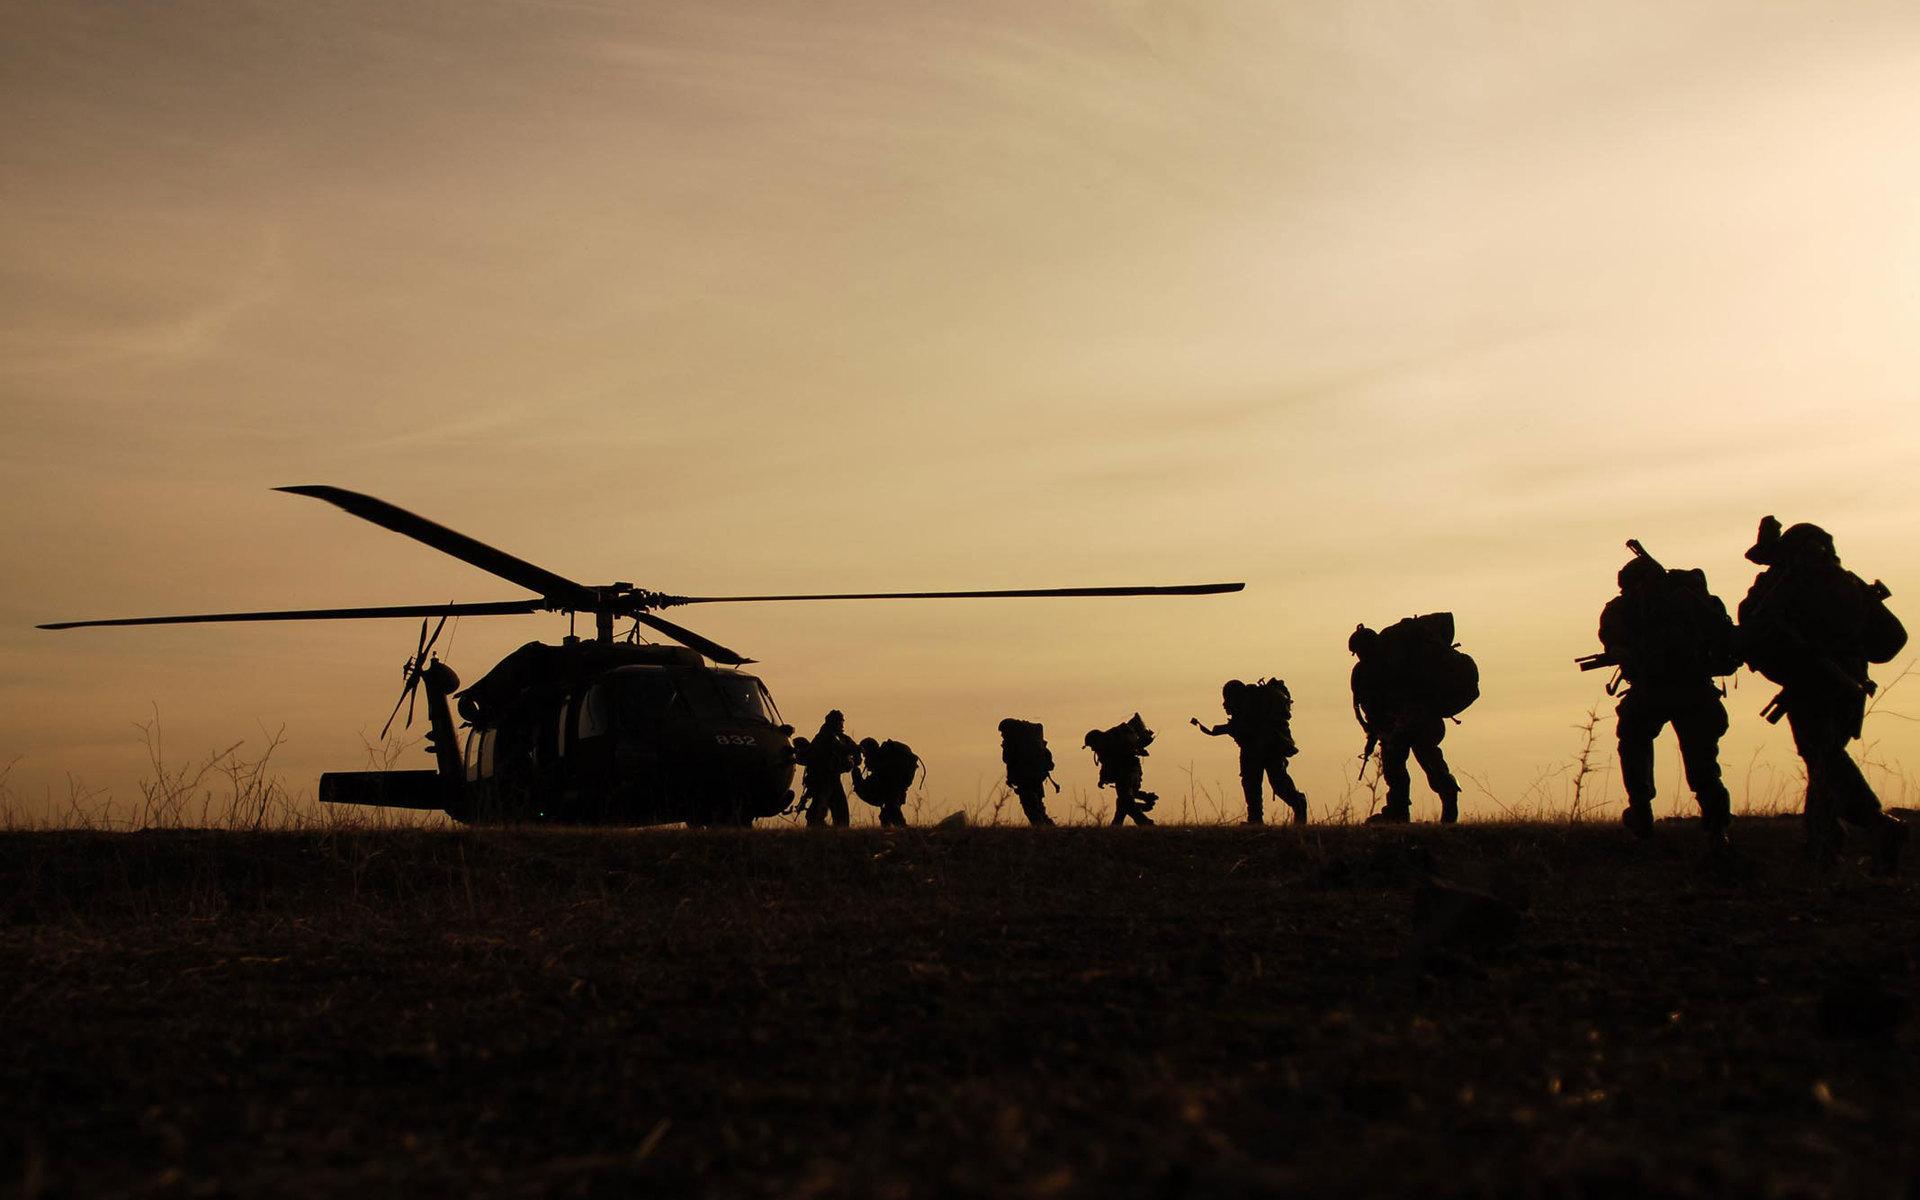 sun down army image